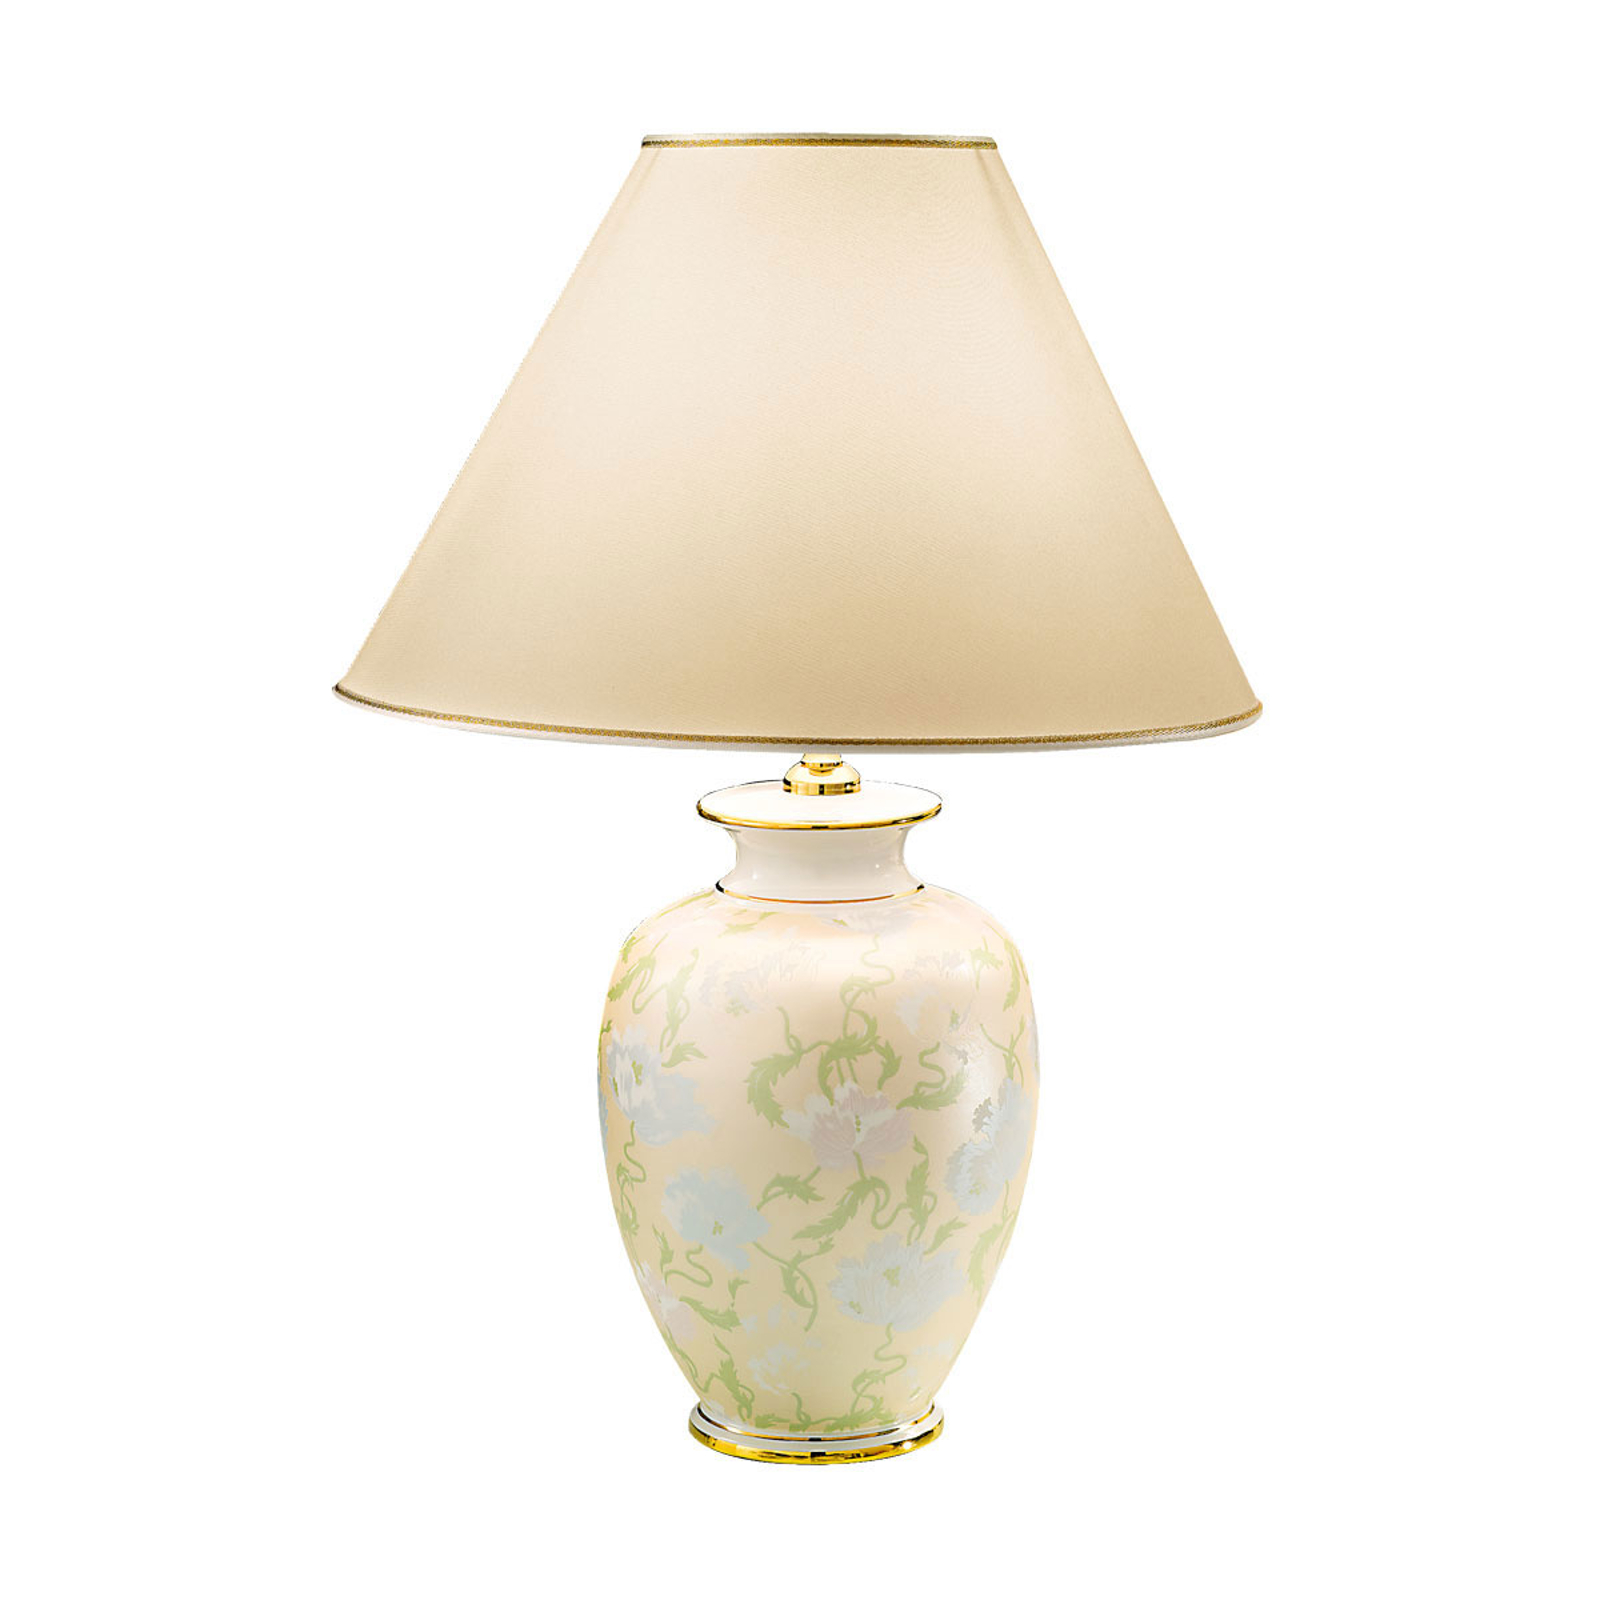 Lampe à poser Giardino Panse, à la main, Ø 40cm